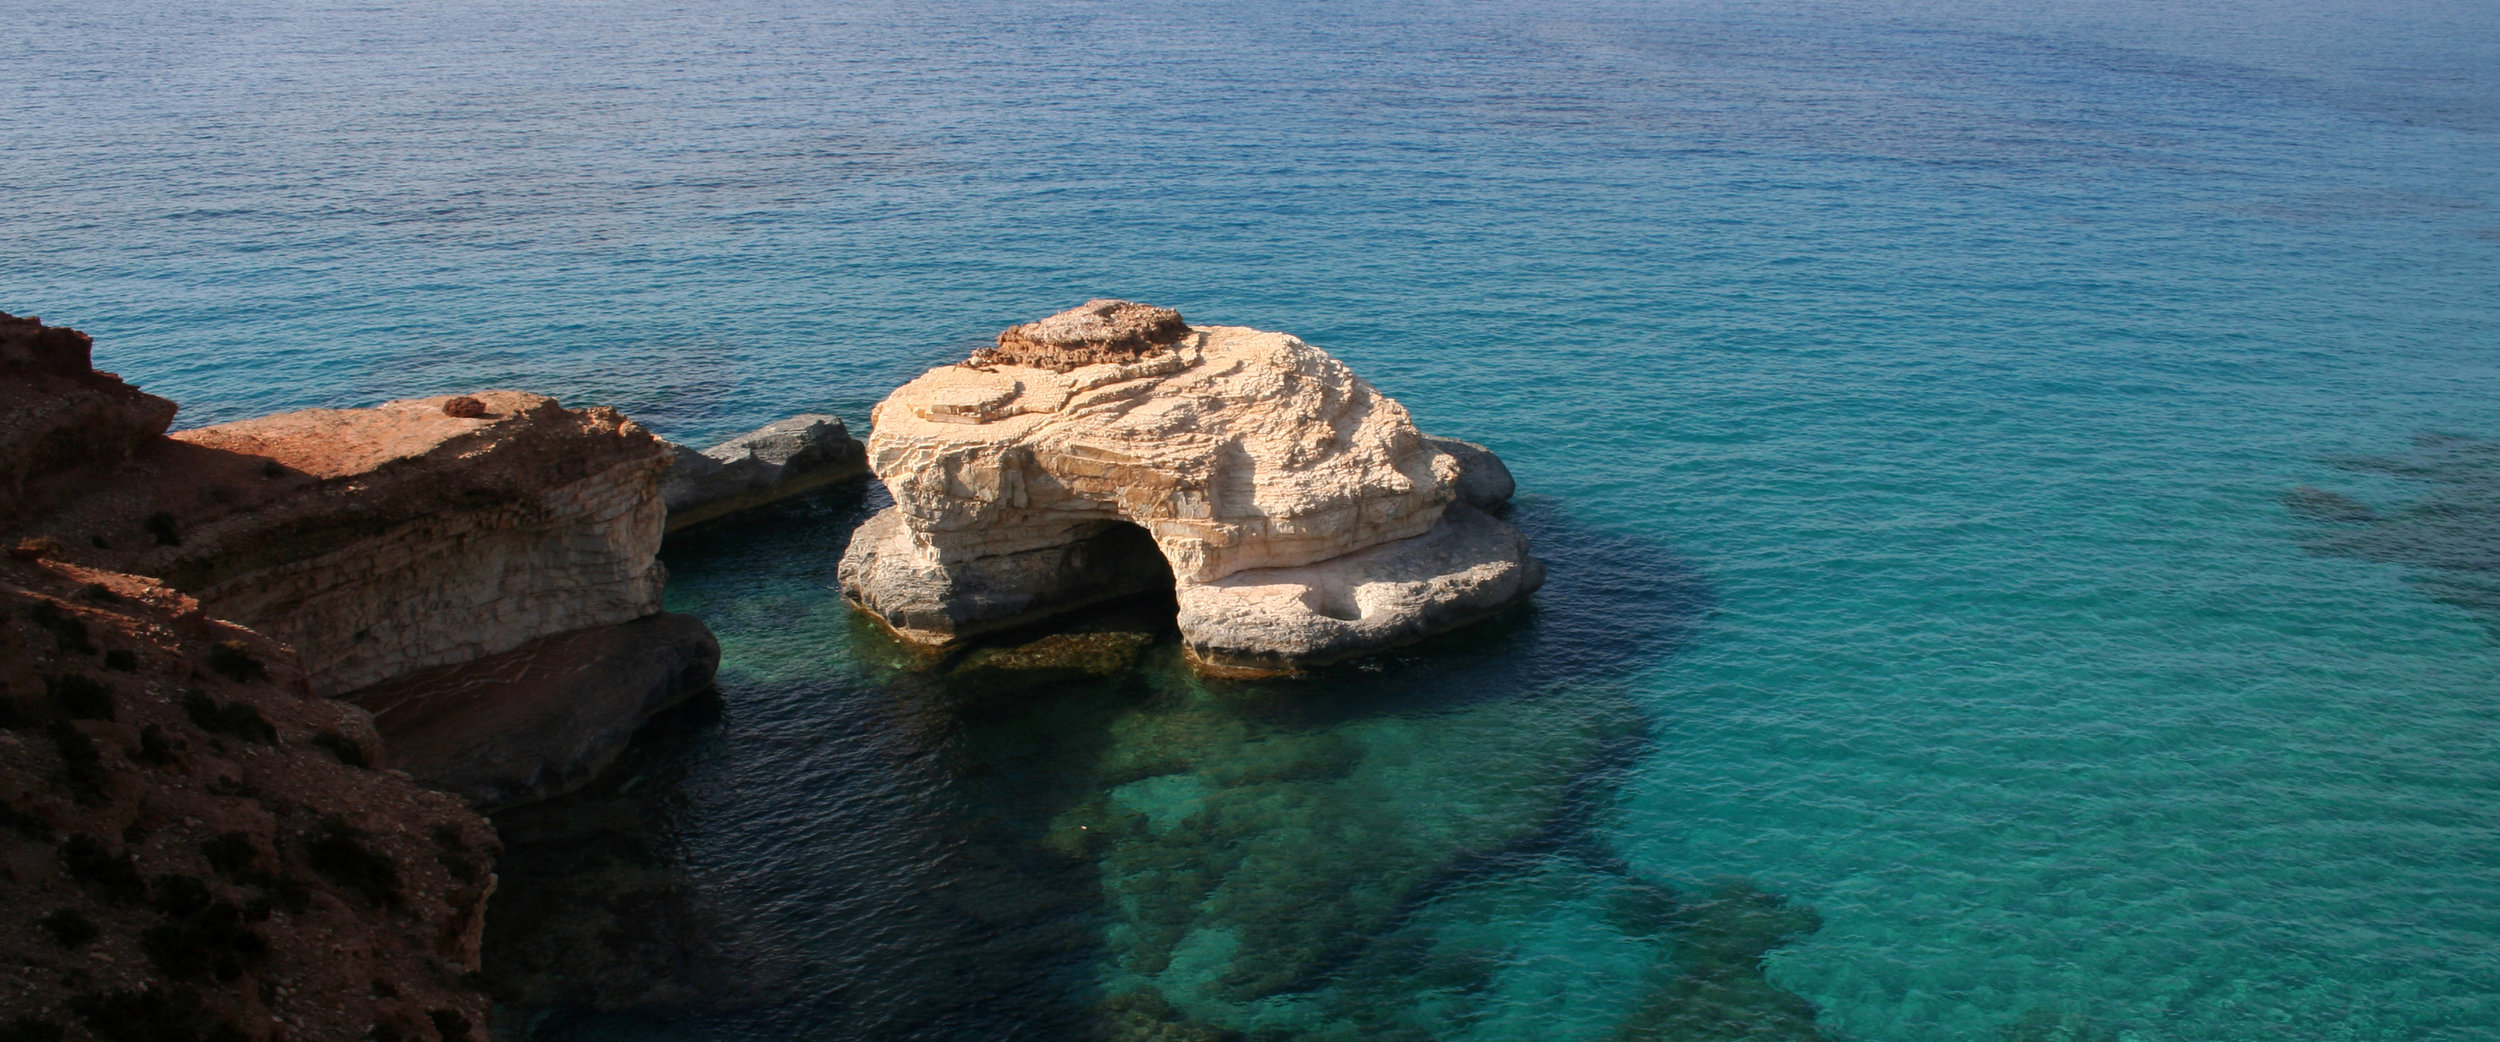 athrun, libya (photo: giulio lucarini)